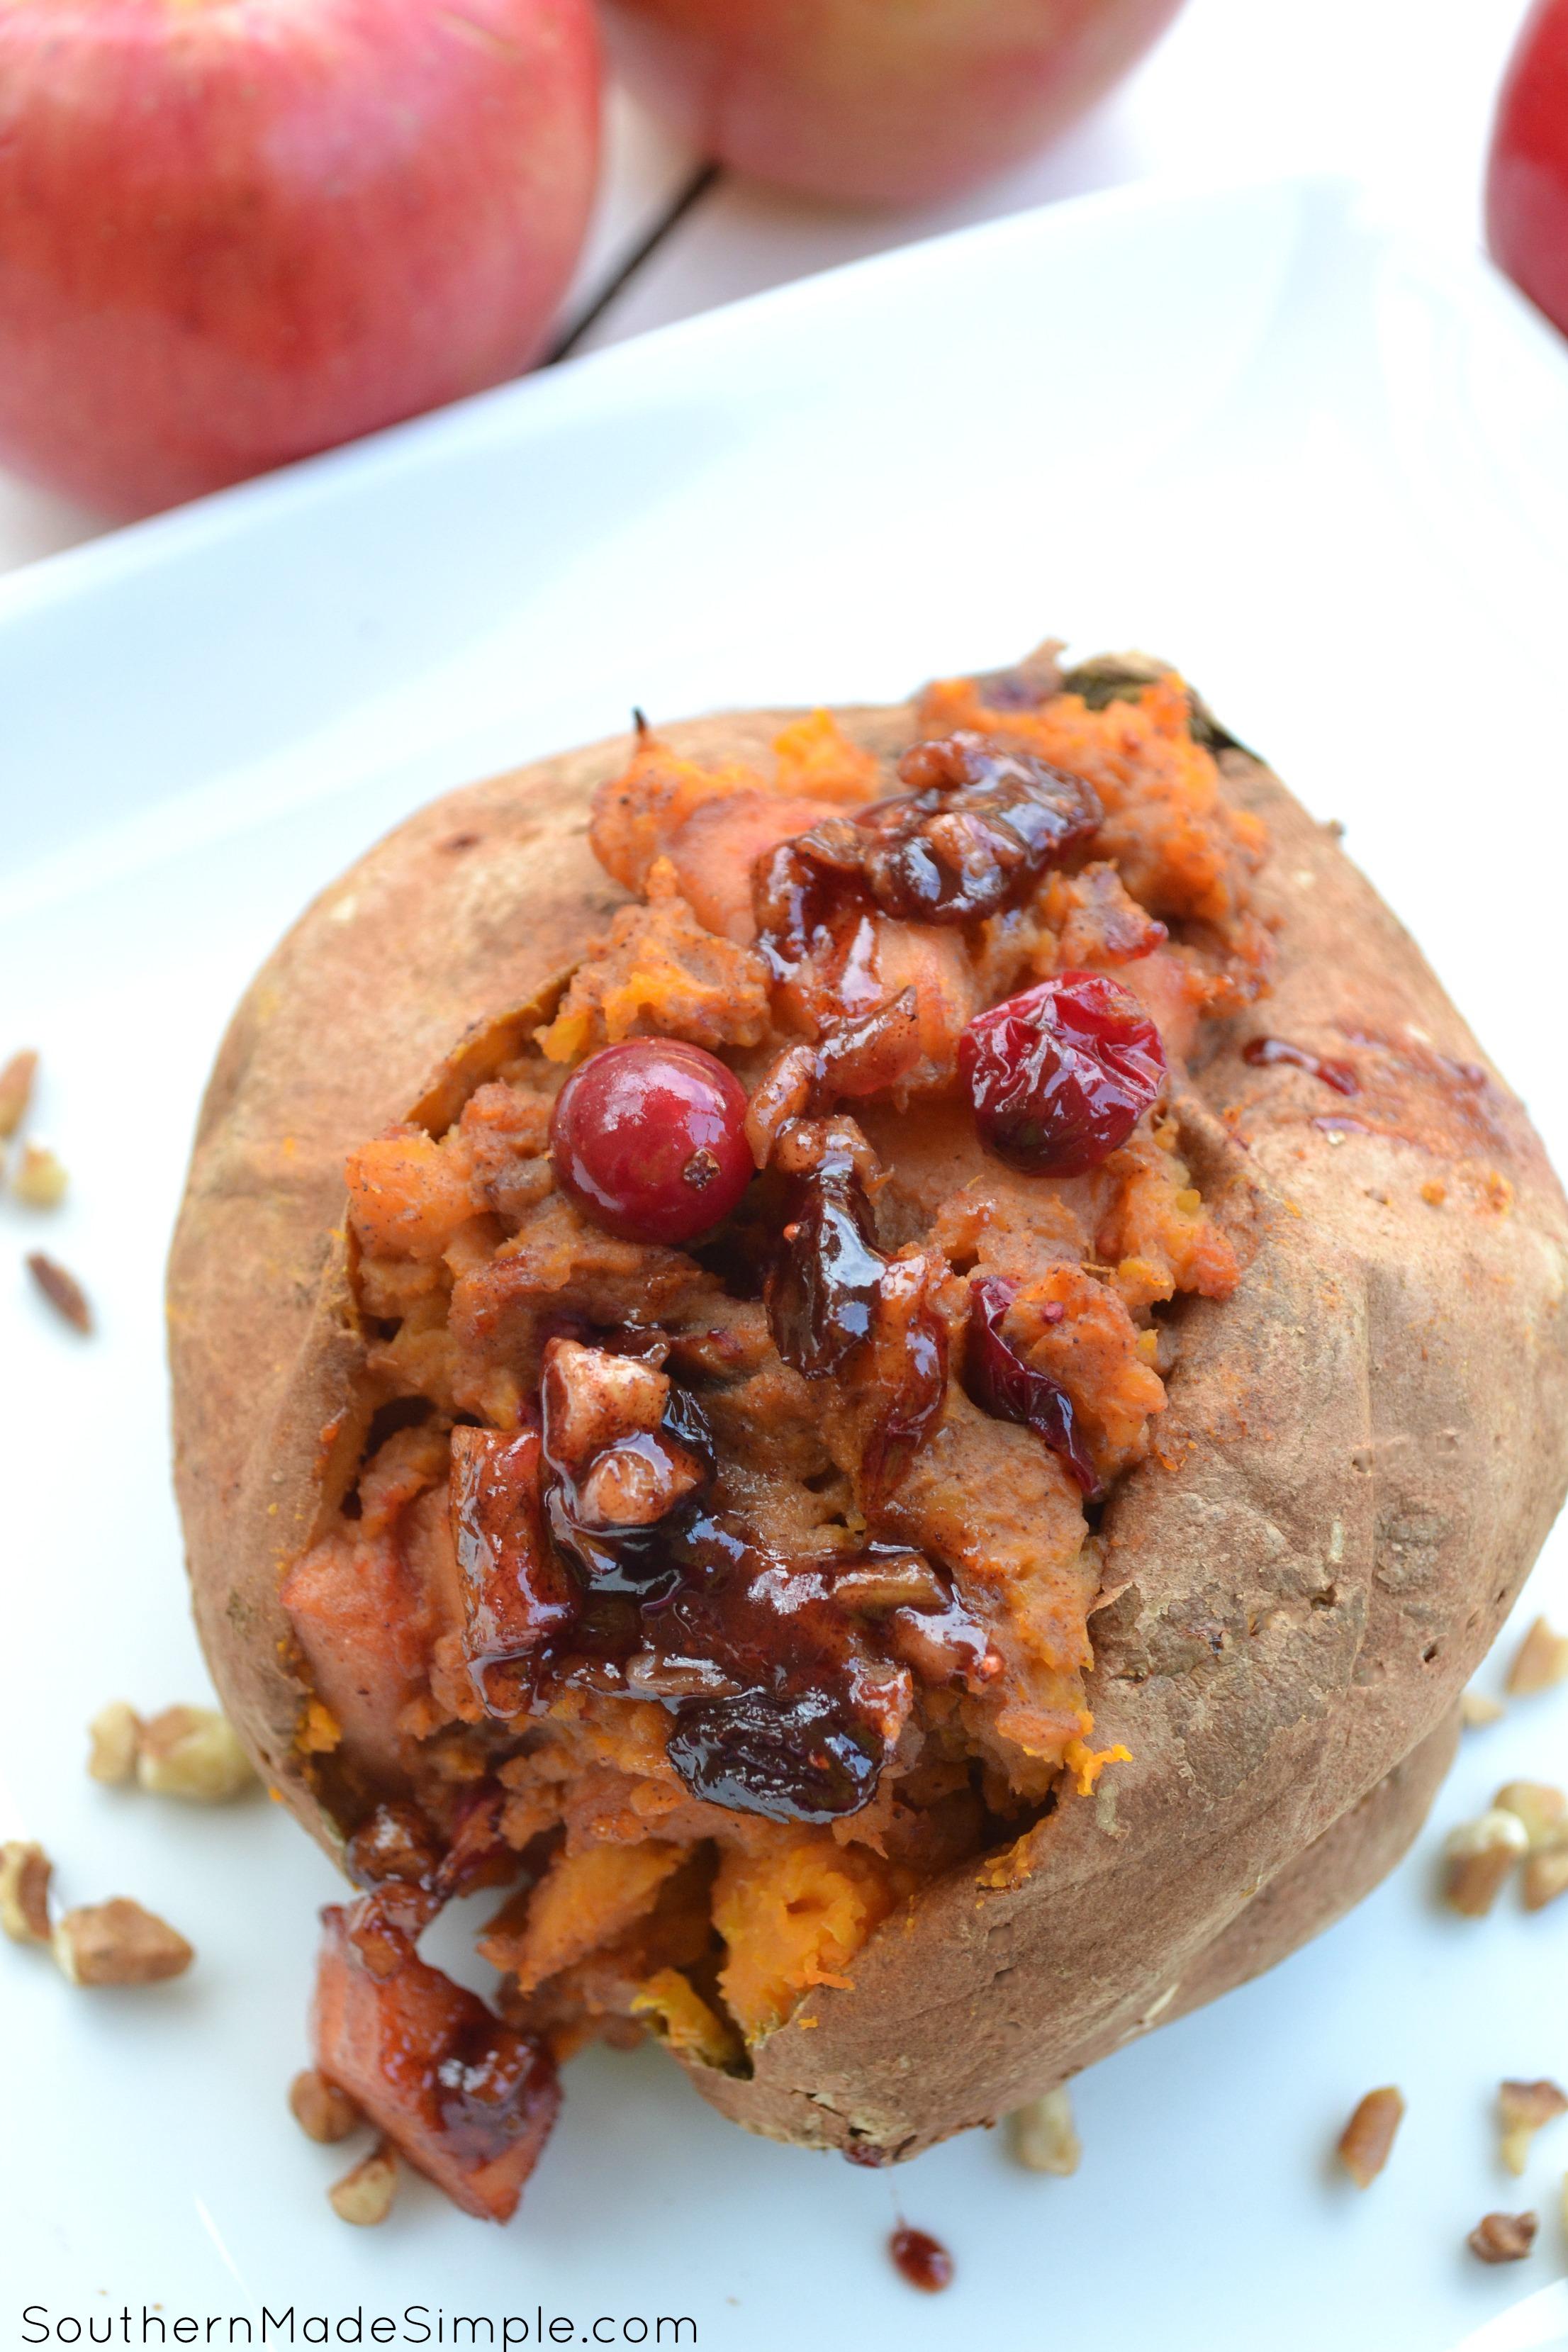 Brown Sugar Pecan and Cinnamon Apple Stuffed Sweet Potatoes